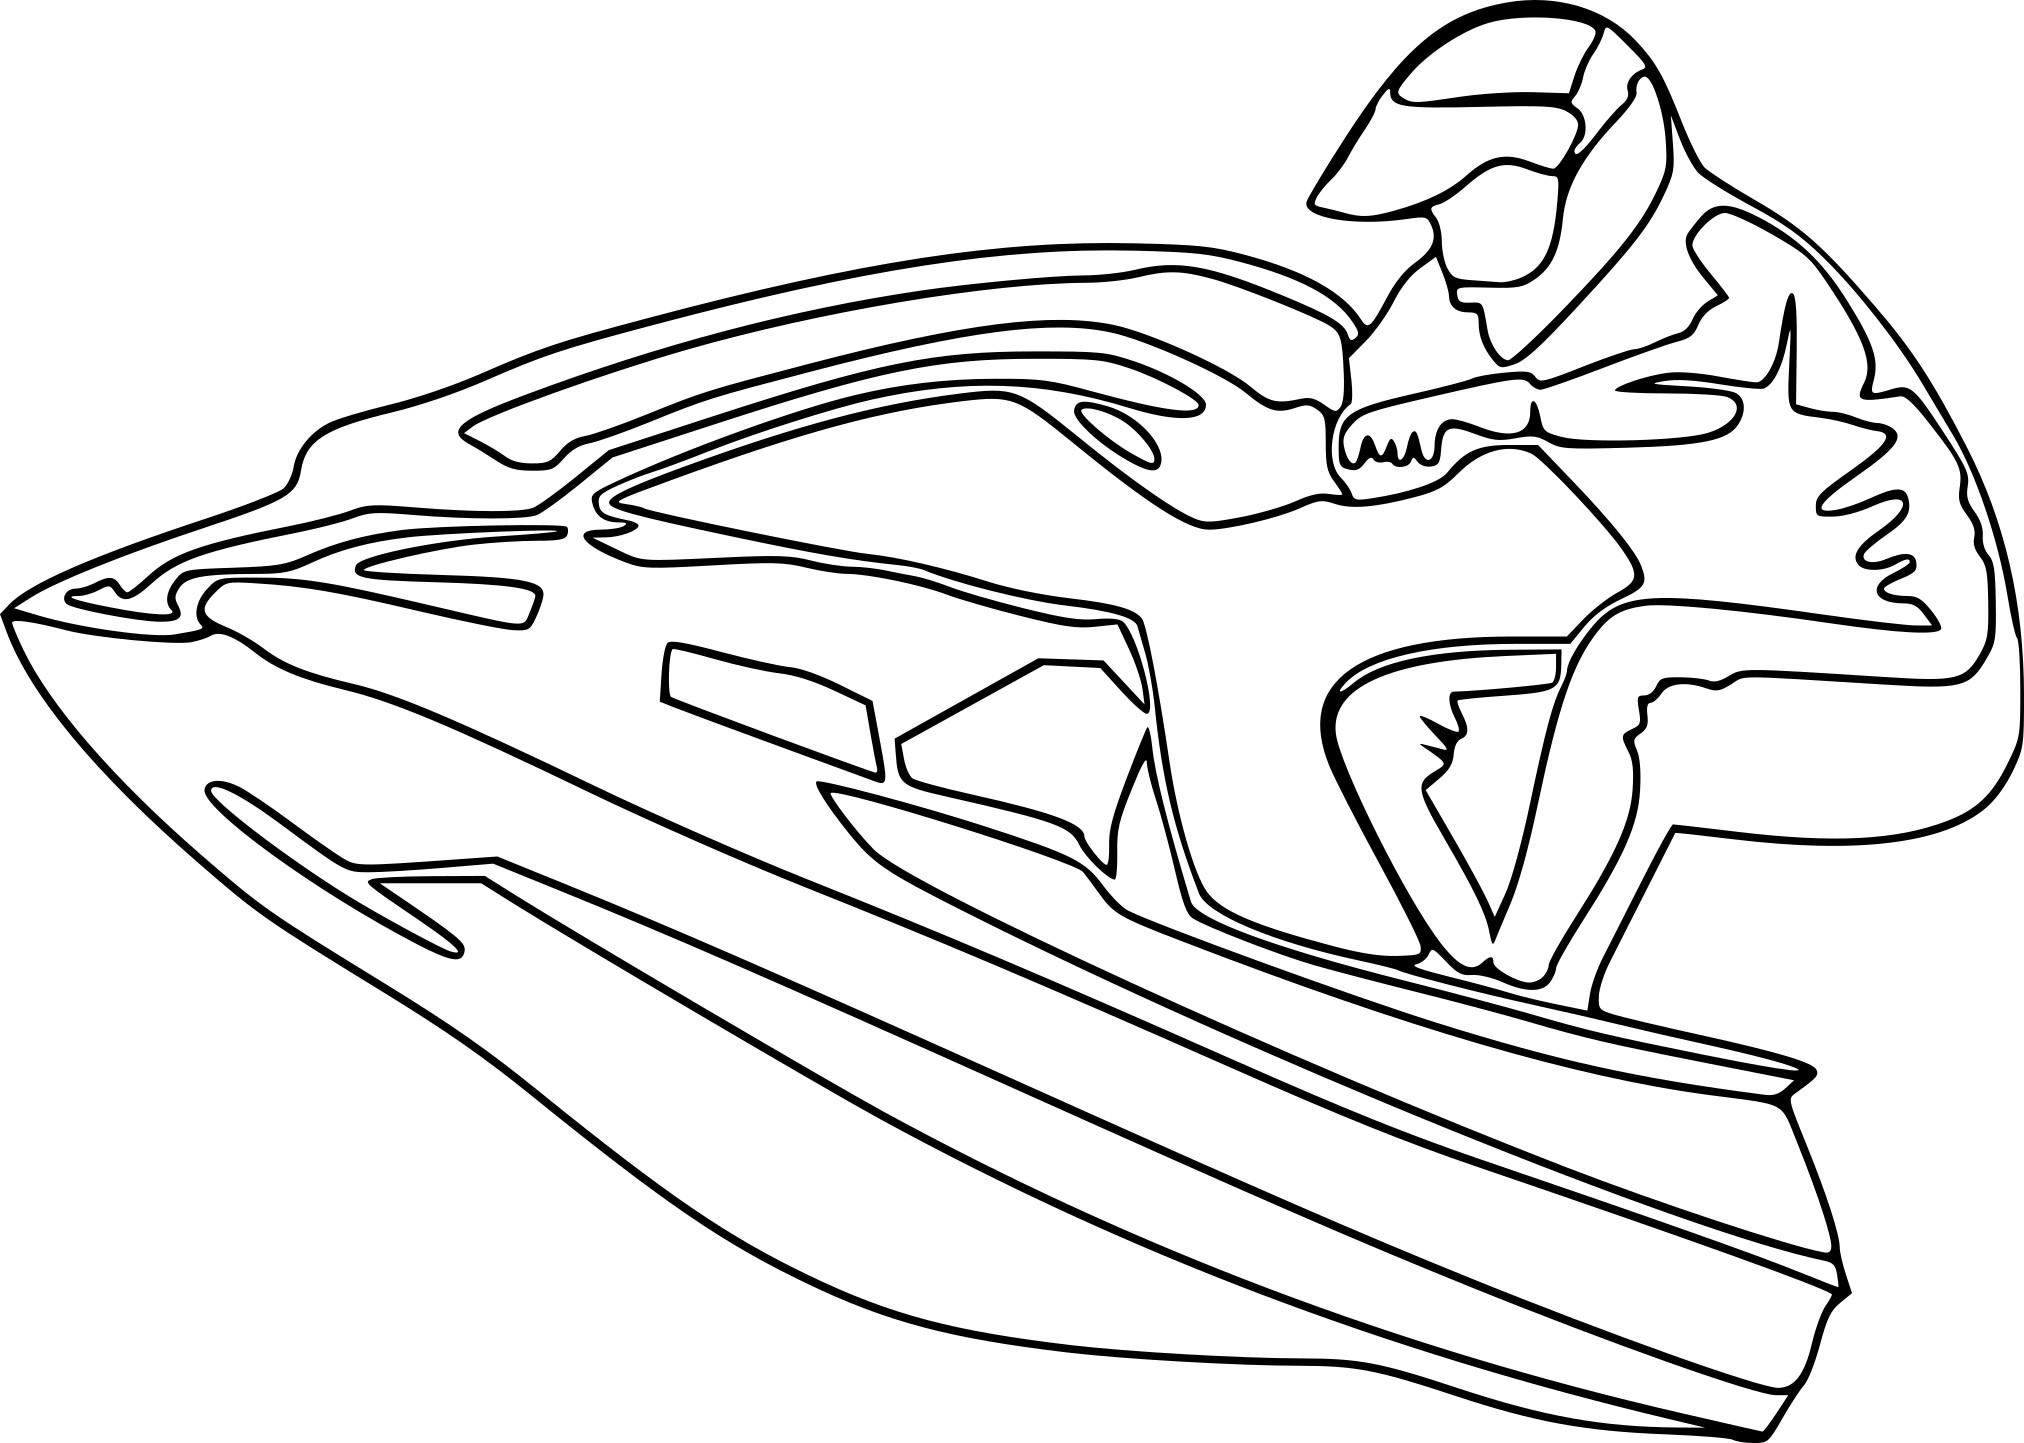 Coloriage scooter des mers imprimer - Des dessins a imprimer ...